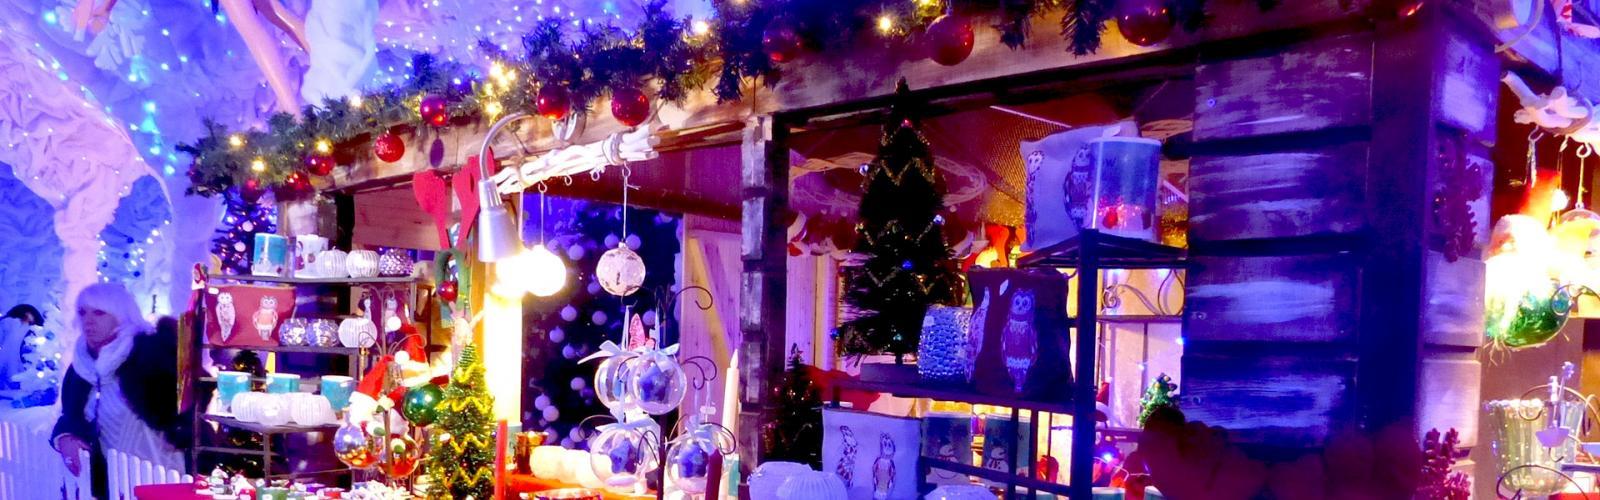 Féeries de Noël d'Aniane © Antonnella kadouche - oti-sgvh